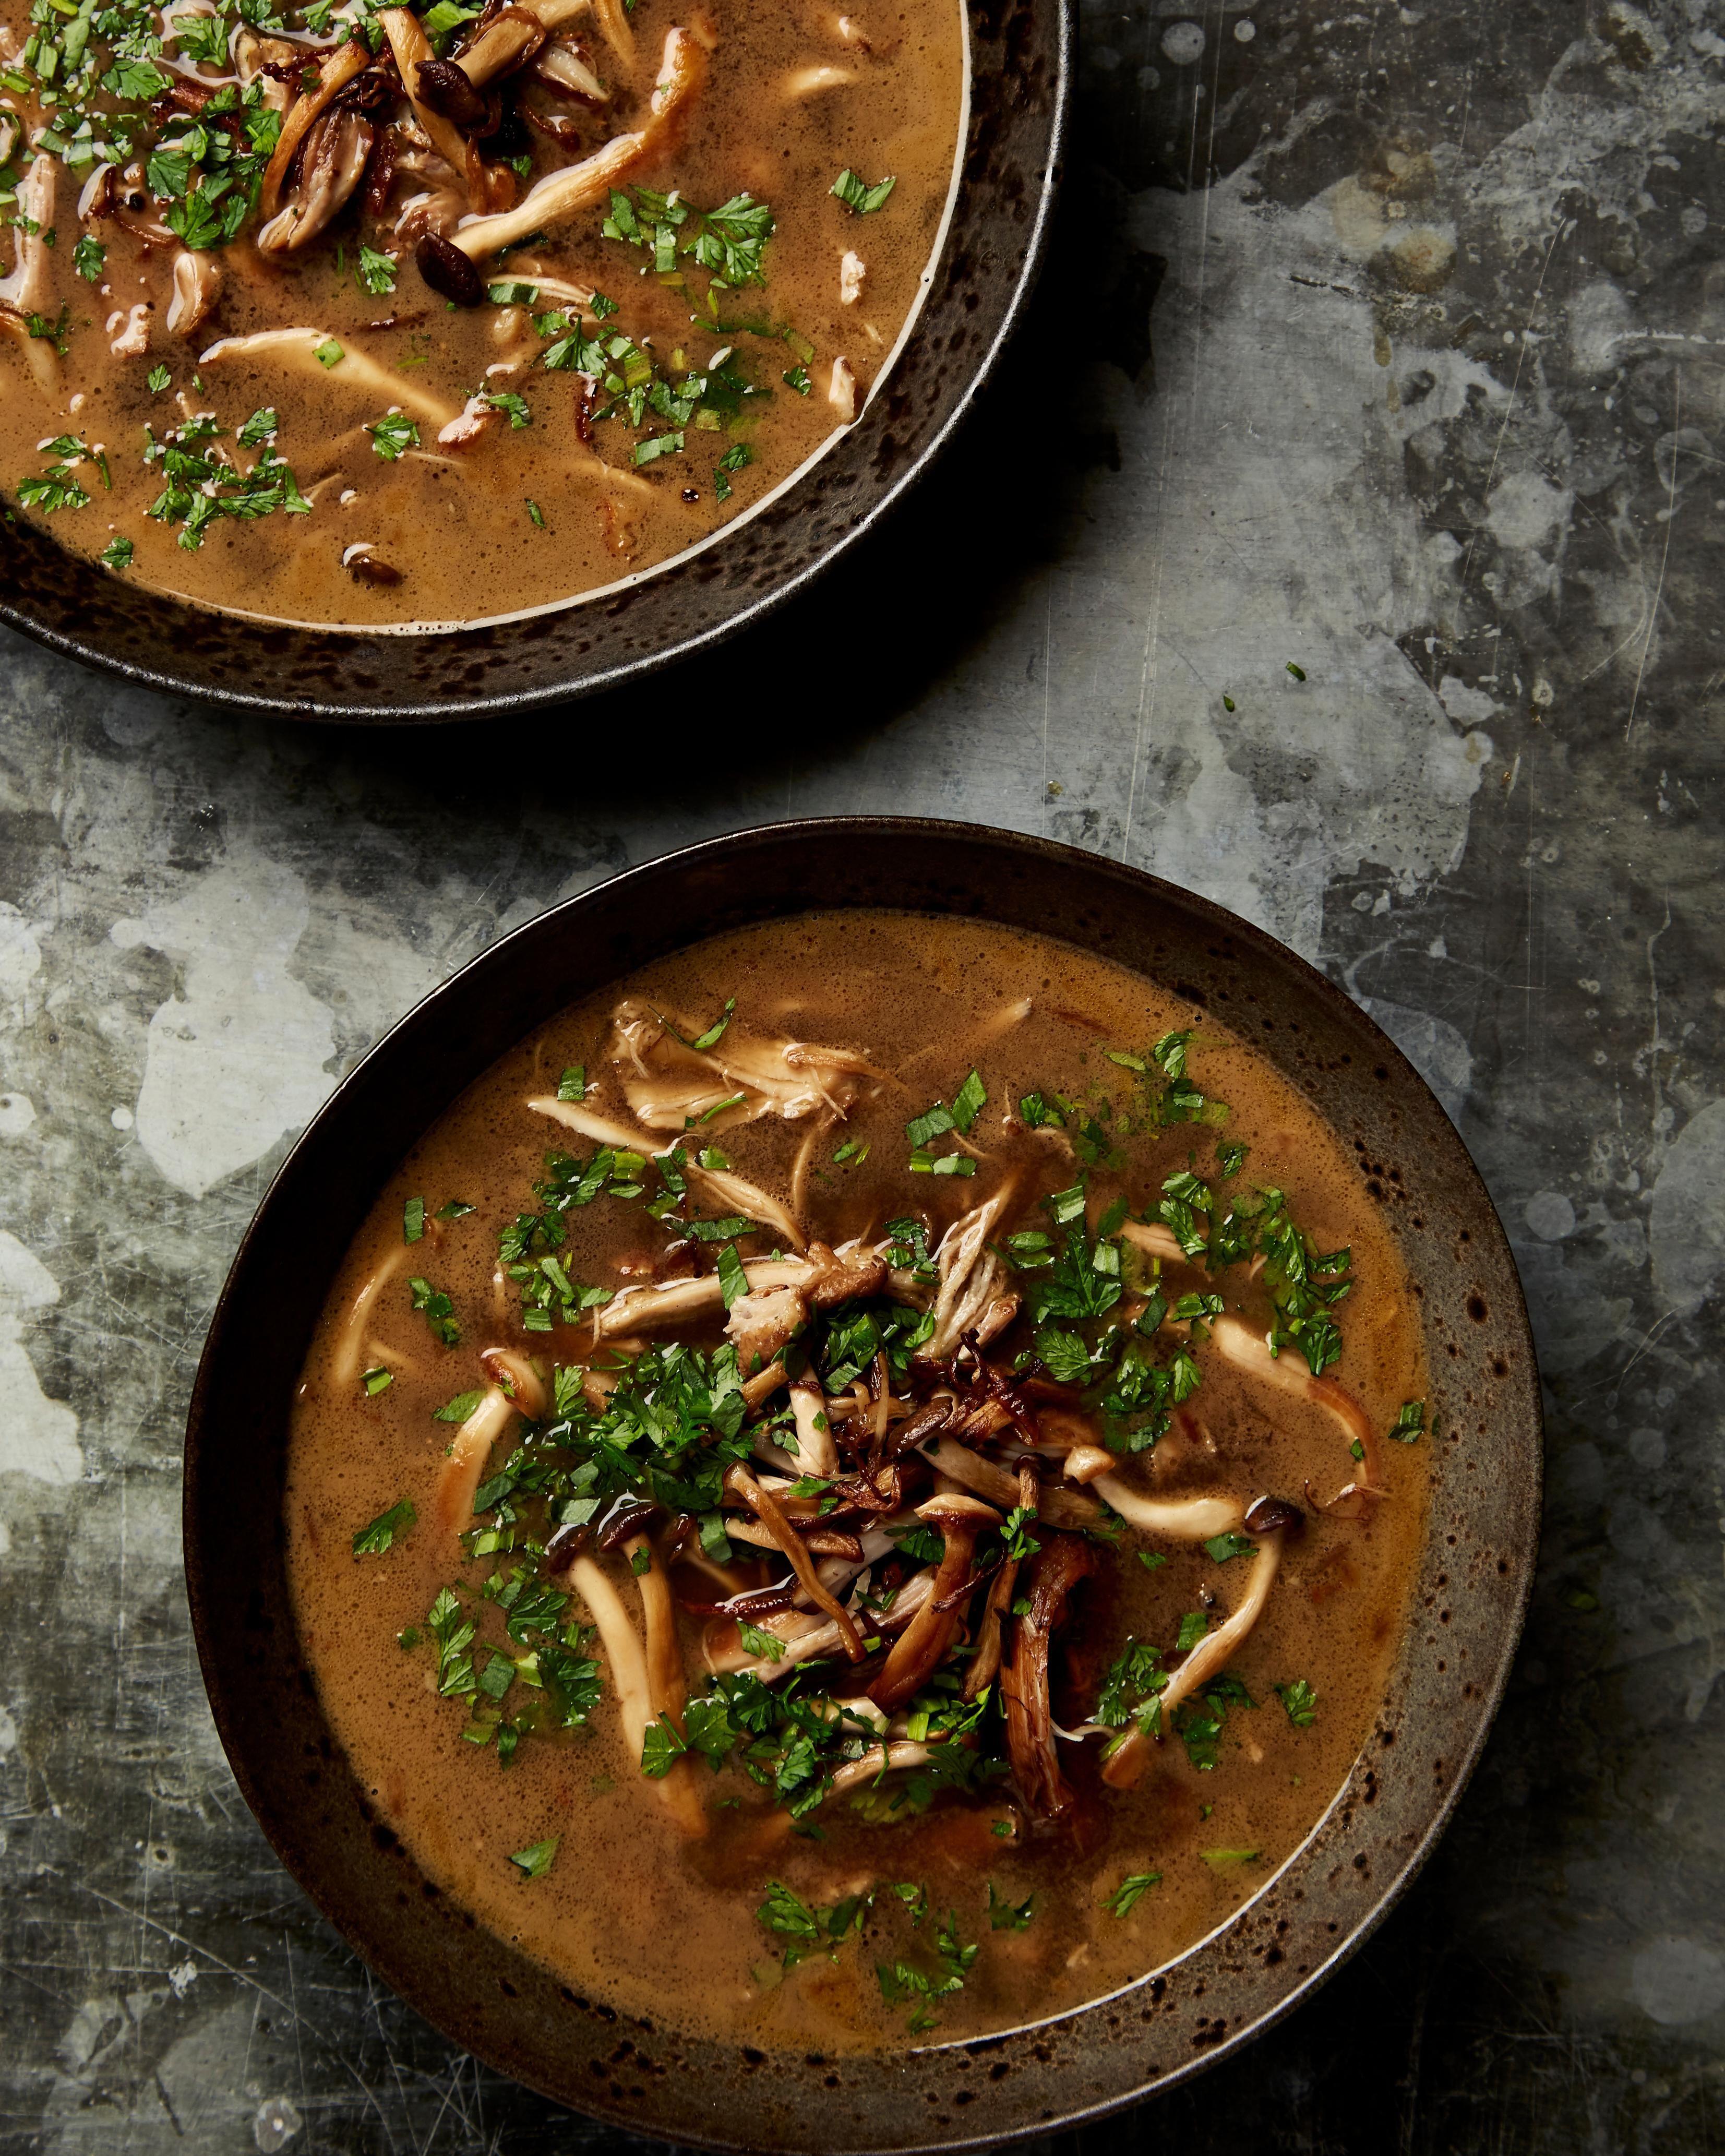 Yotam Ottolenghis Recipes For Warming Autumn Soups Autunno CaldoRicette